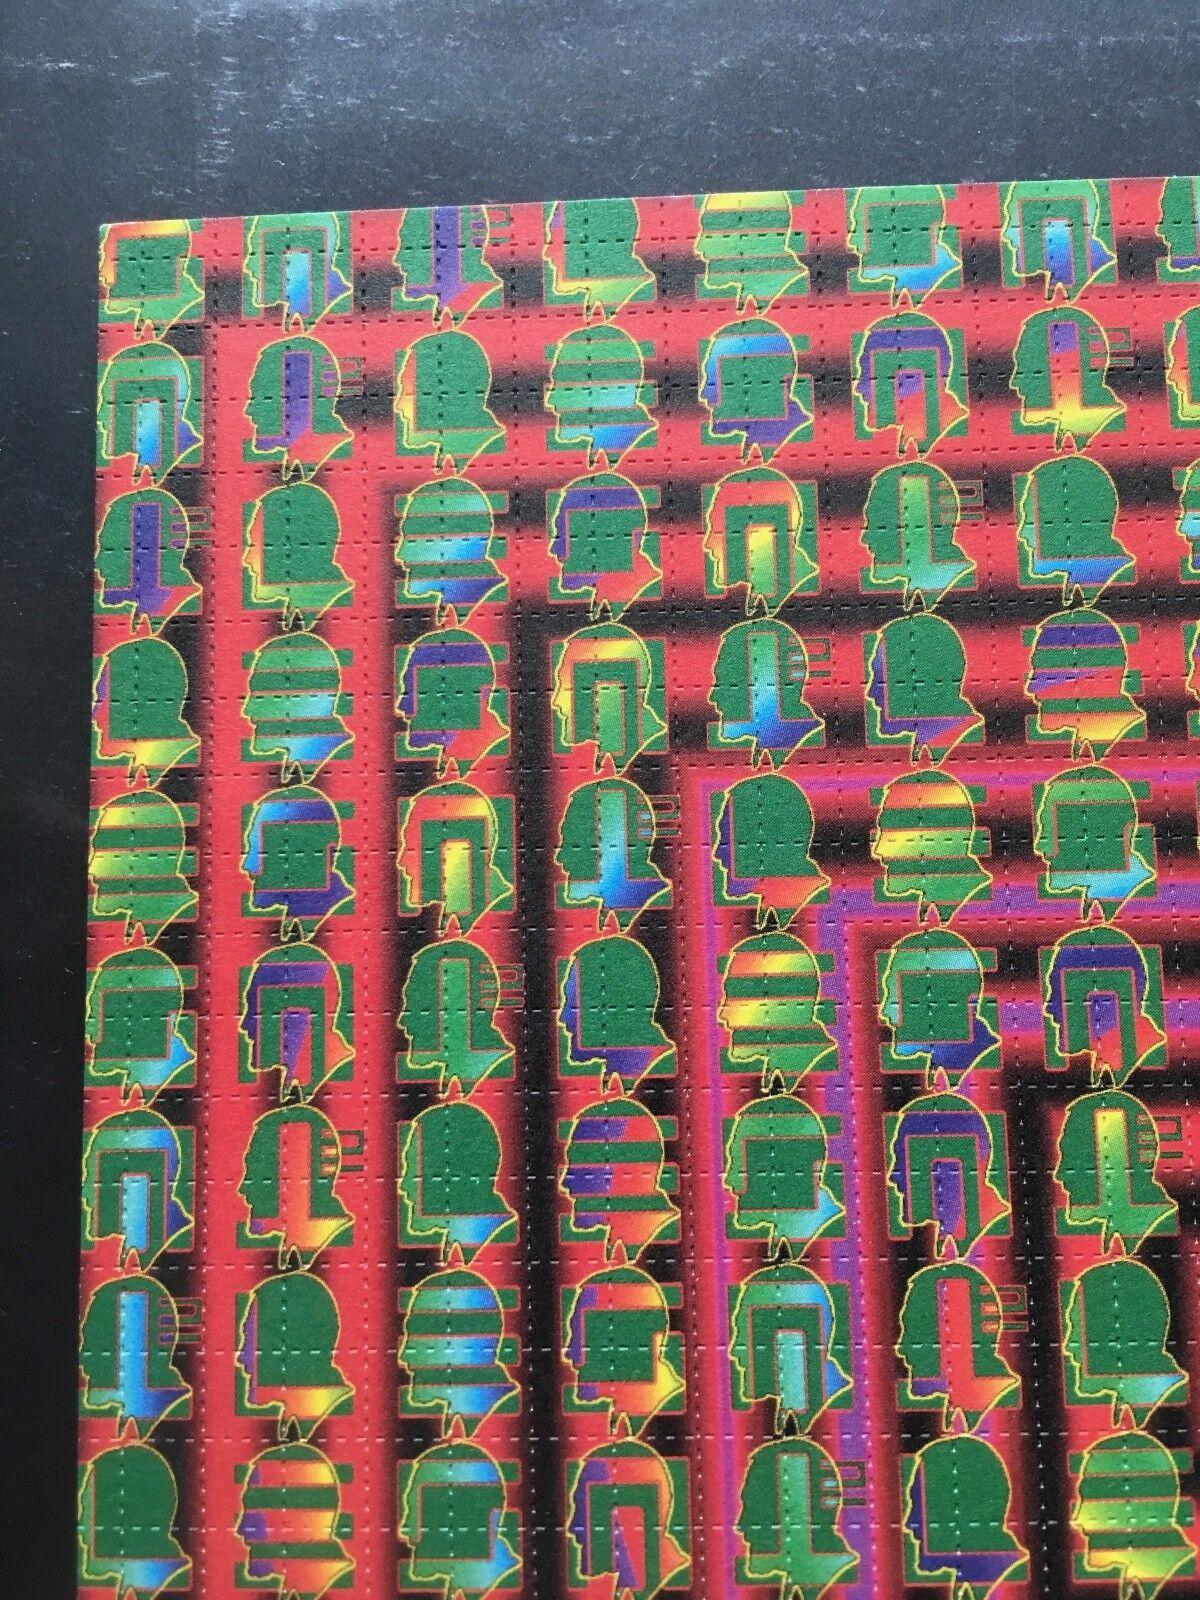 Timothy Leary Puddle Vintage LSD Blotter Art - Mark McCloud Dirty Dozen - $45.00